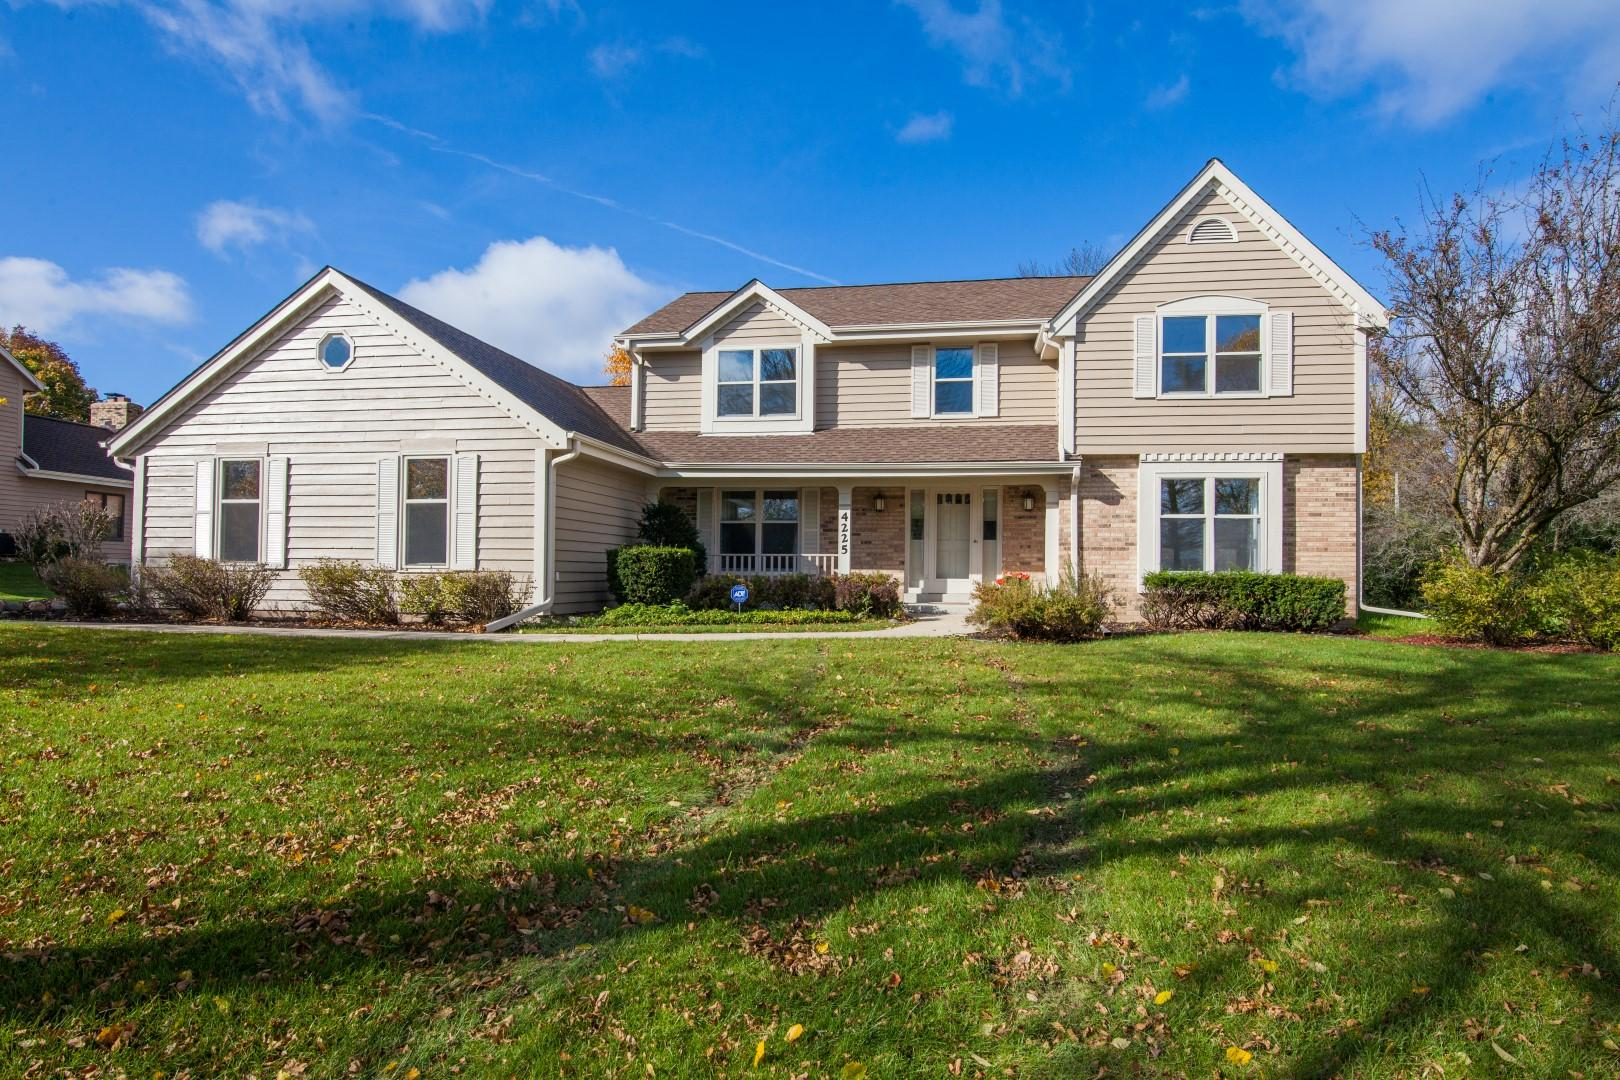 4225 Brook Ln, Brookfield, Wisconsin 53005, 4 Bedrooms Bedrooms, 8 Rooms Rooms,2 BathroomsBathrooms,Single-Family,For Sale,Brook Ln,1665540